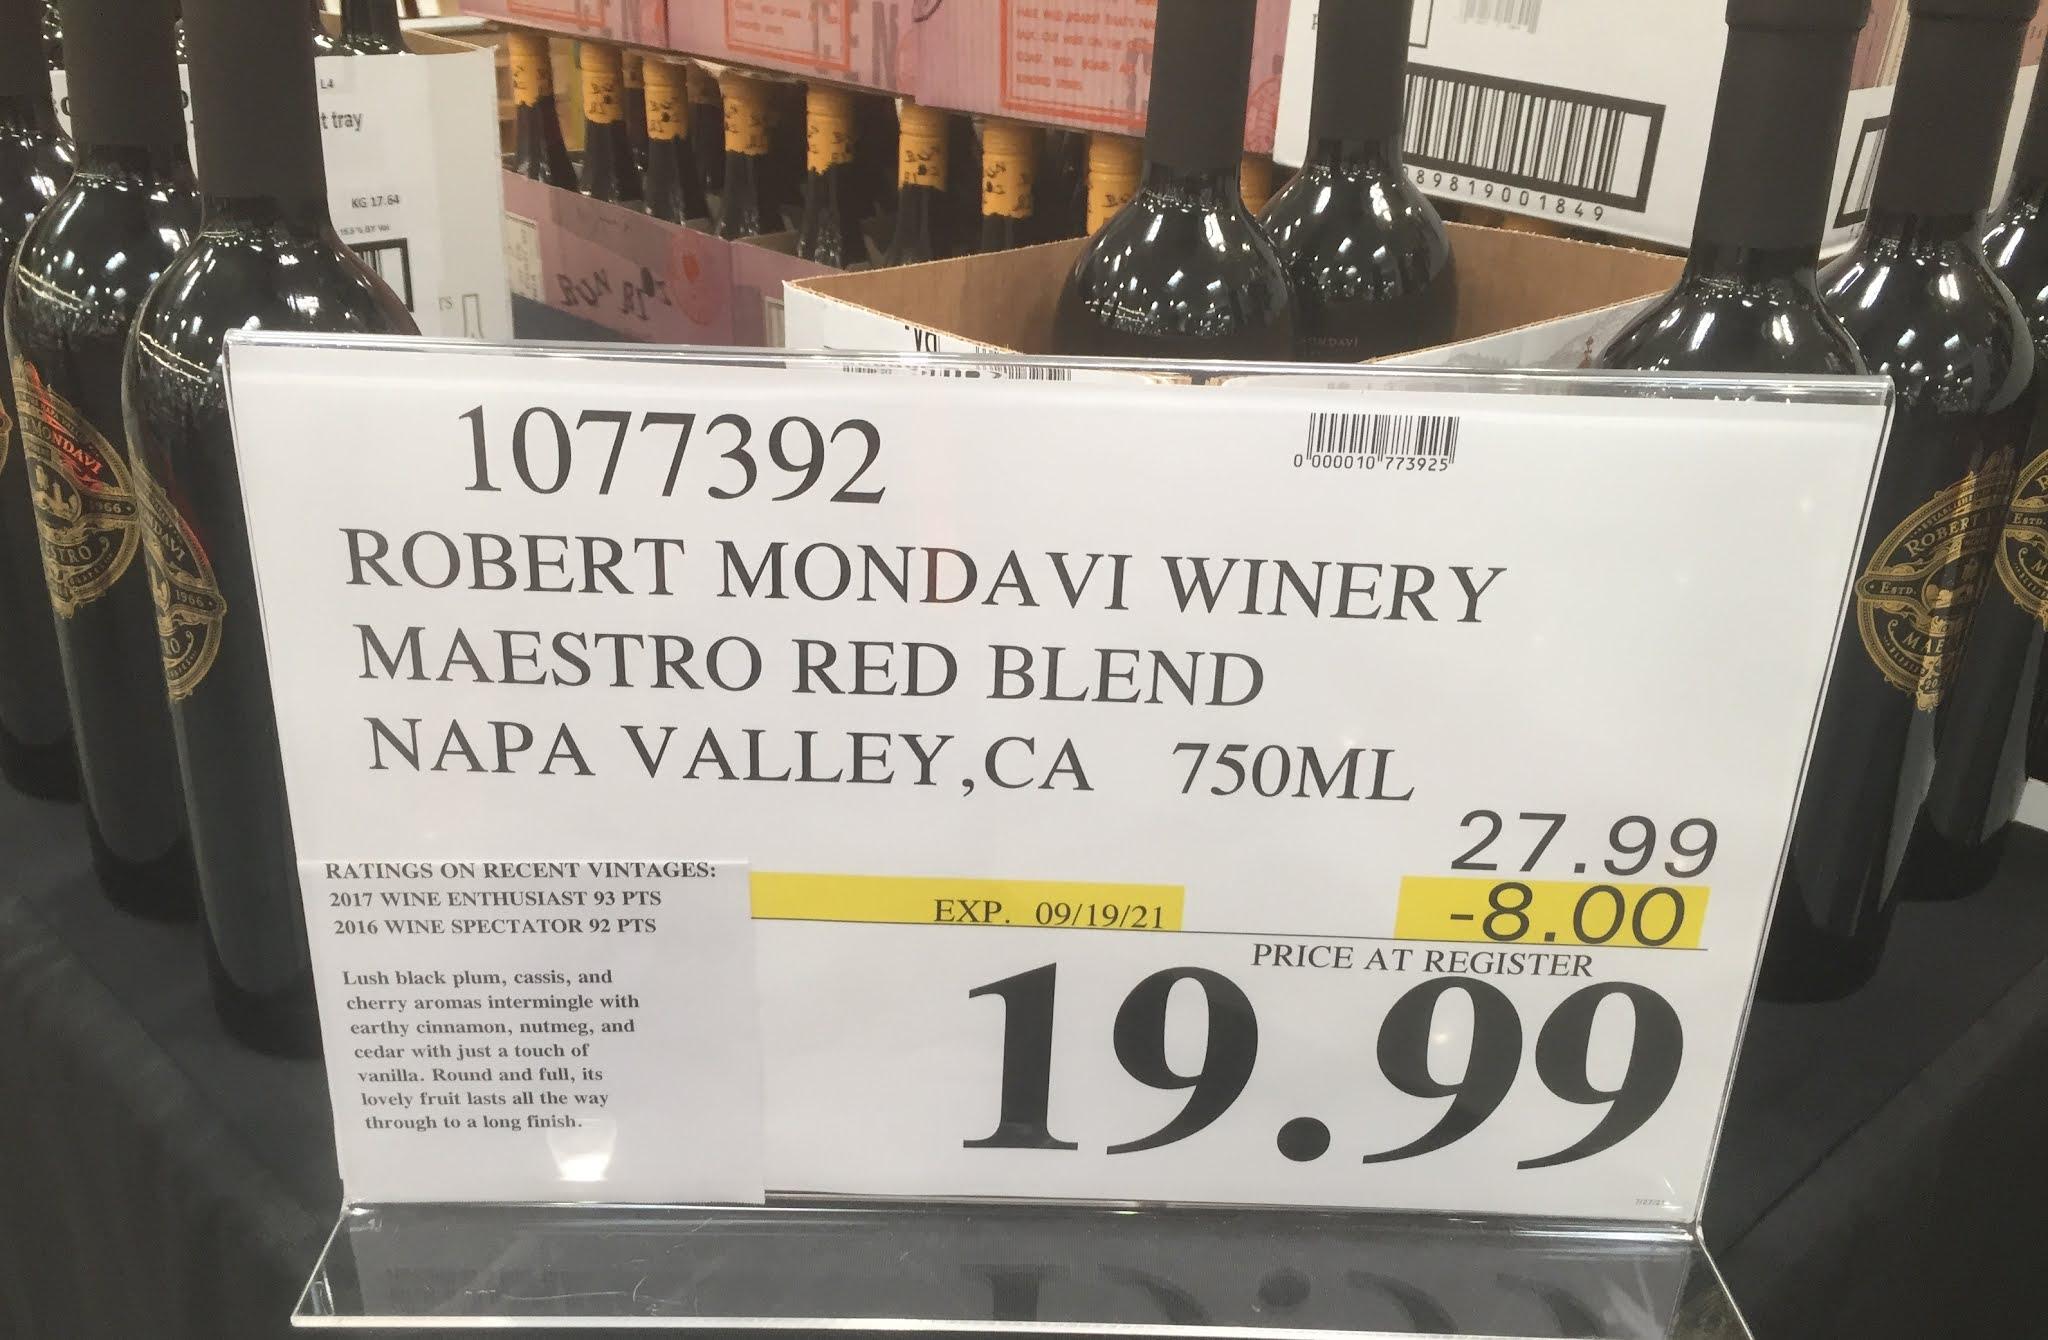 Deal for a bottle of Robert Mondavi Maestro wine at Costco